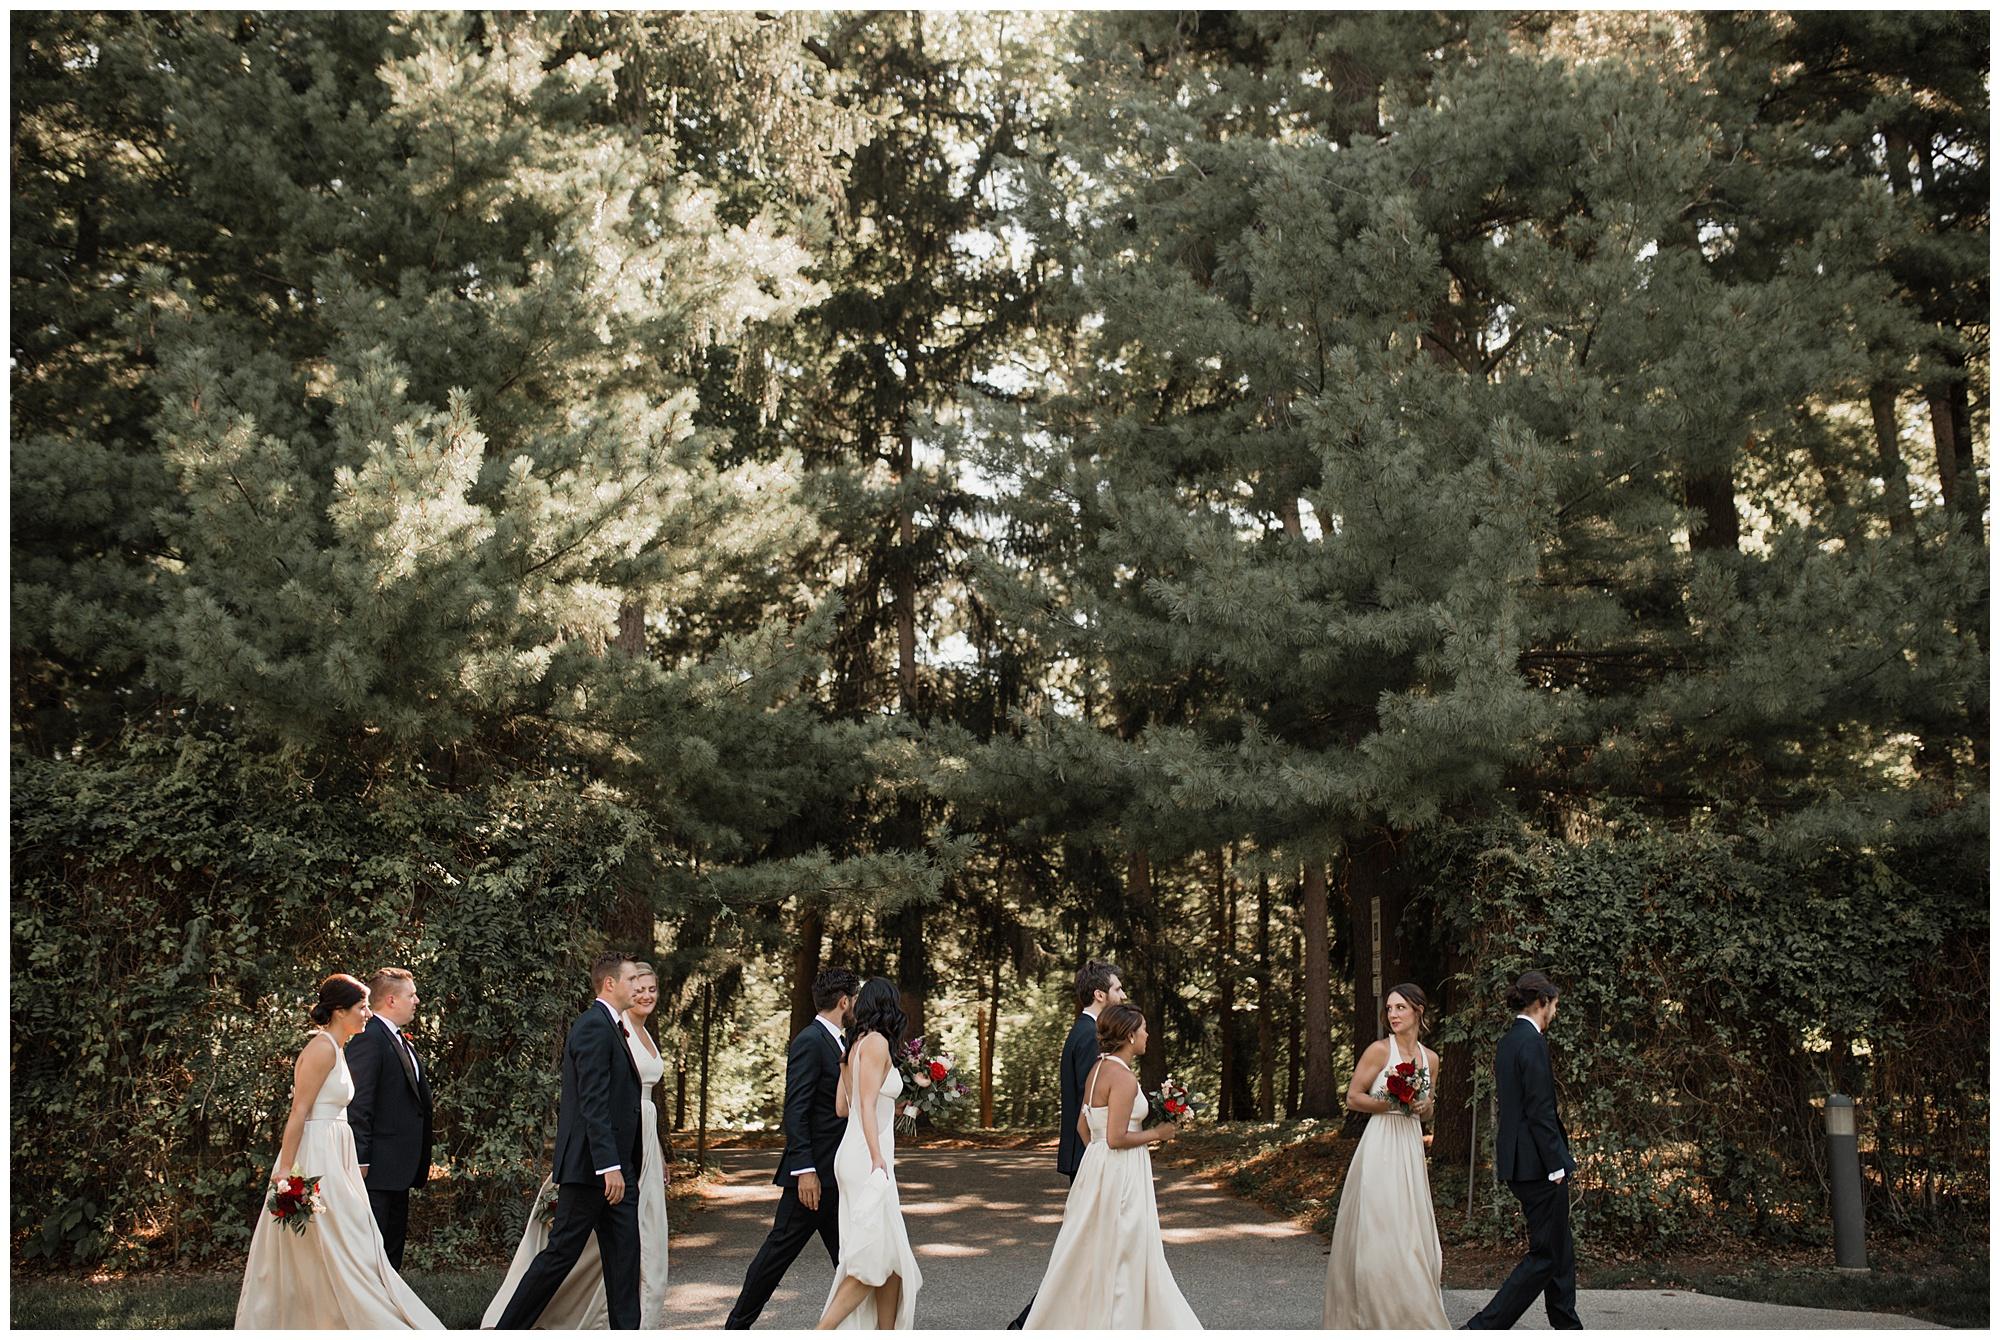 allerton_park_wedding_champaign_il_chicago_wright_photographs_ne_0076.jpg